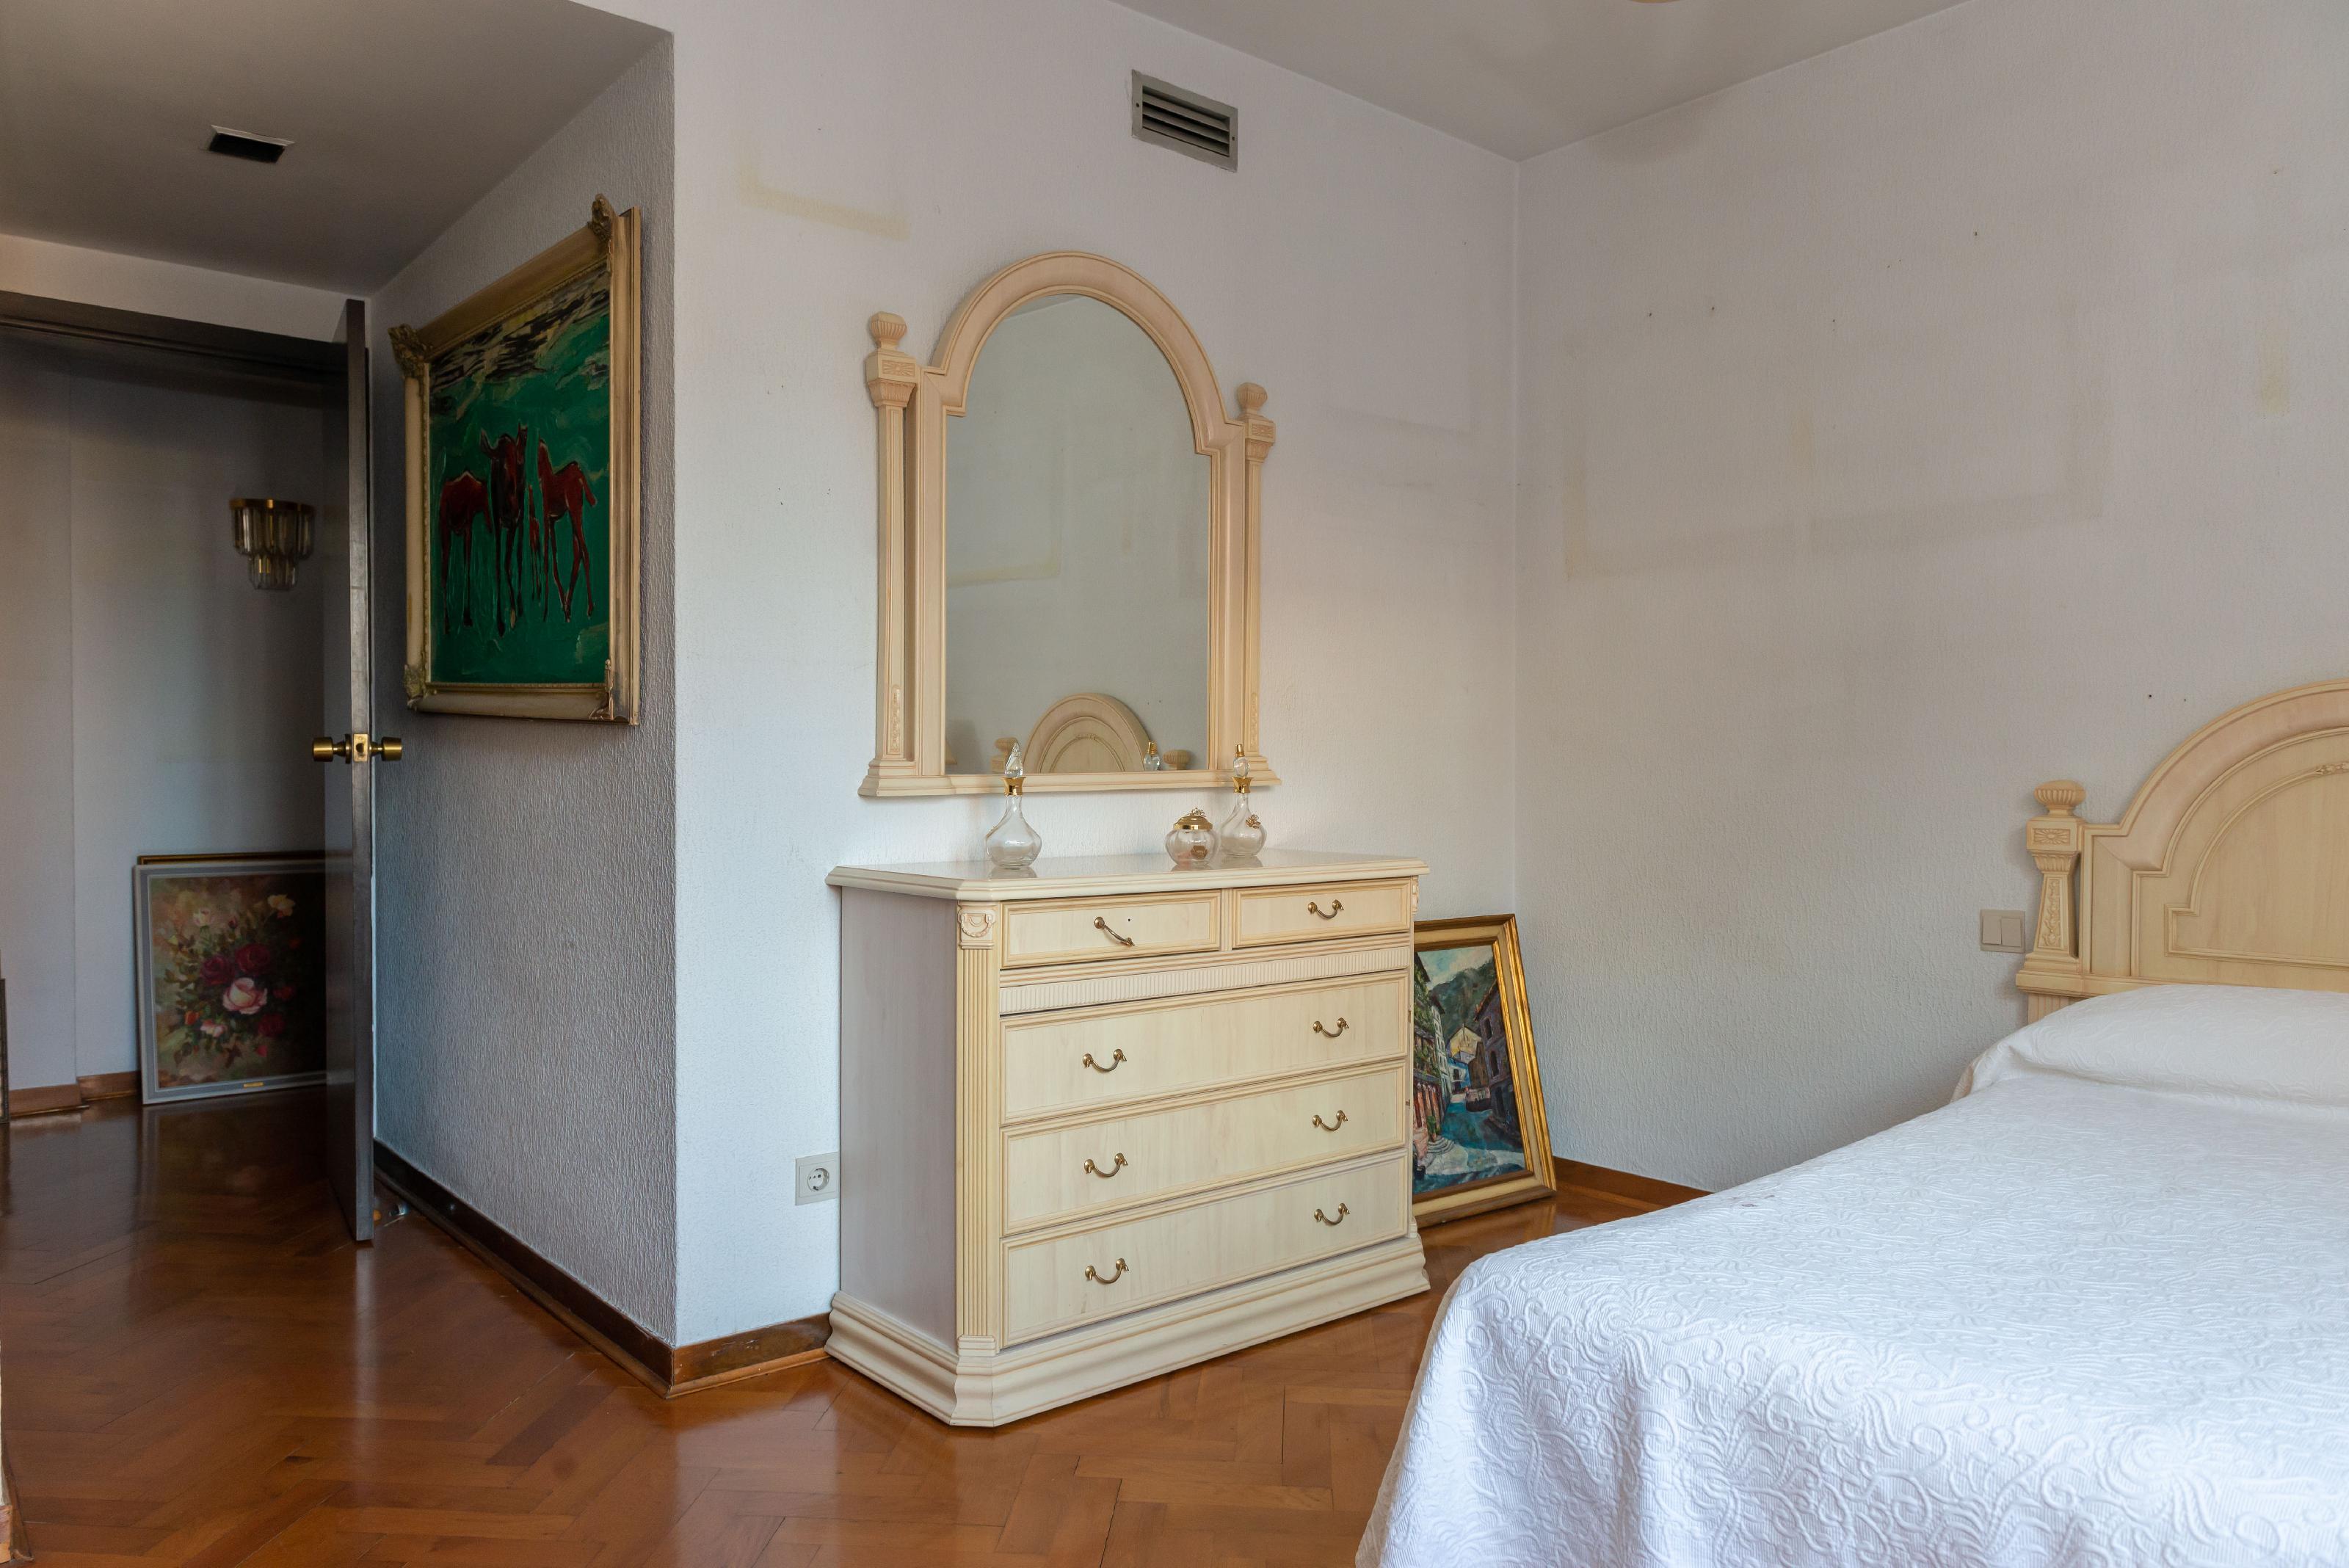 253899 Flat for sale in Sarrià-Sant Gervasi, Sant Gervasi-Galvany 27